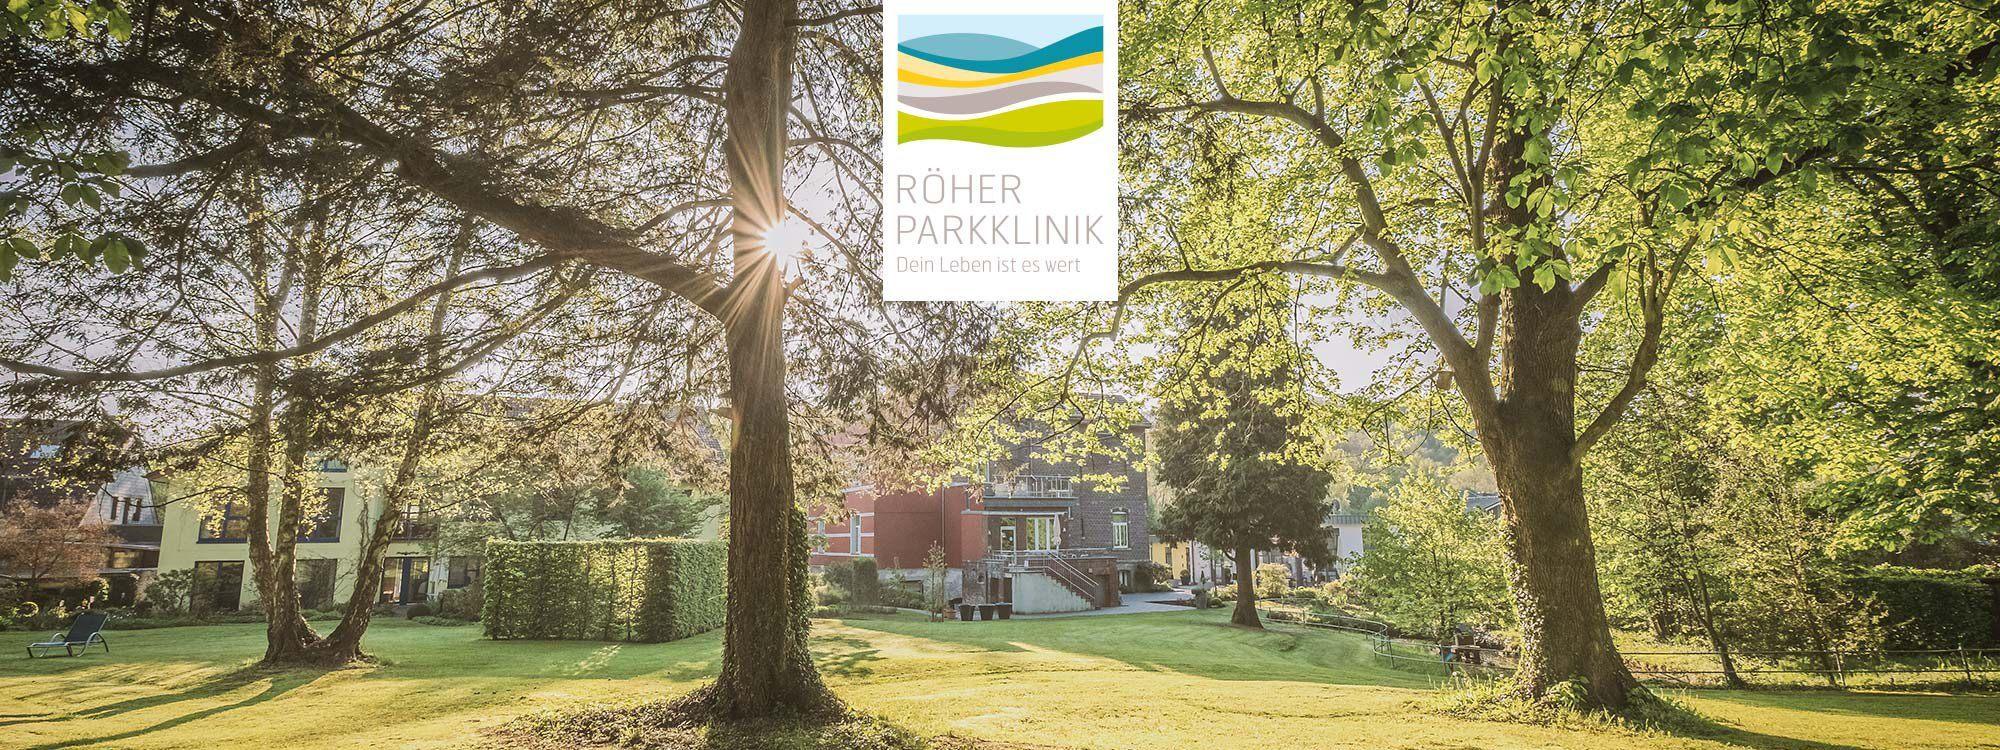 Projekt Röher Parkklinik